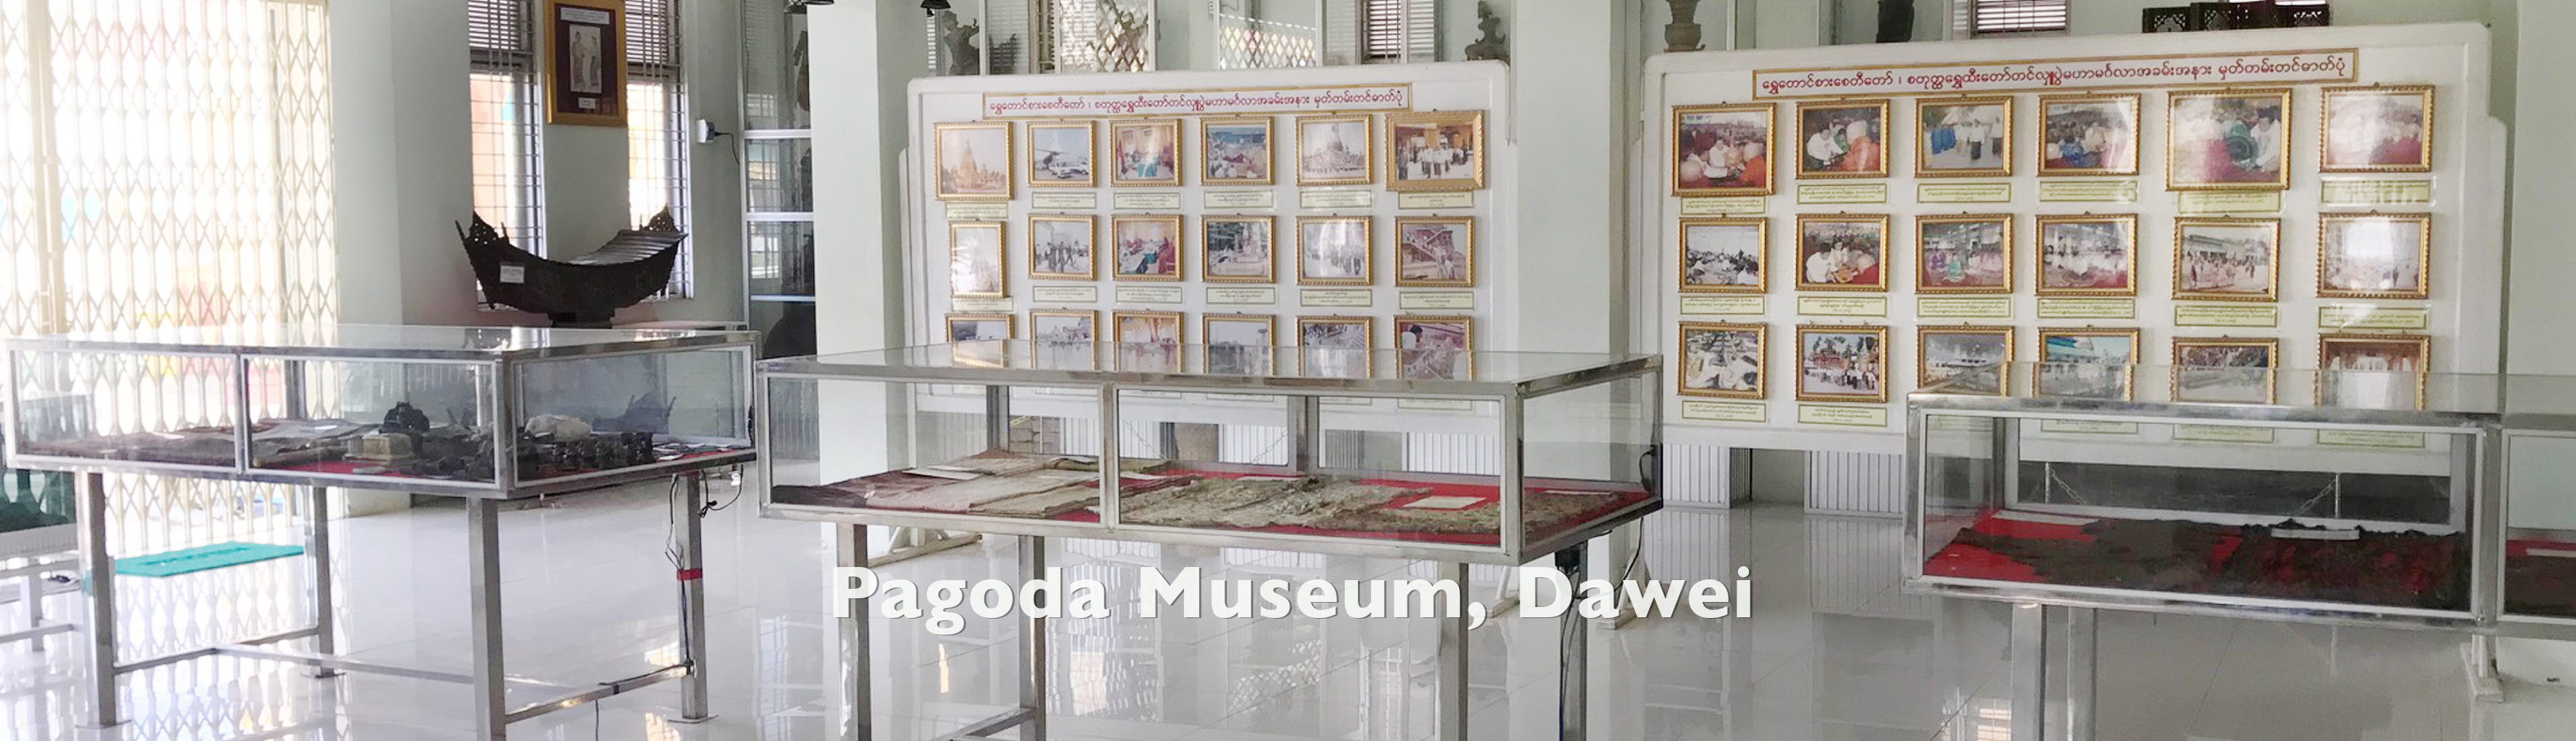 pagoda-museum